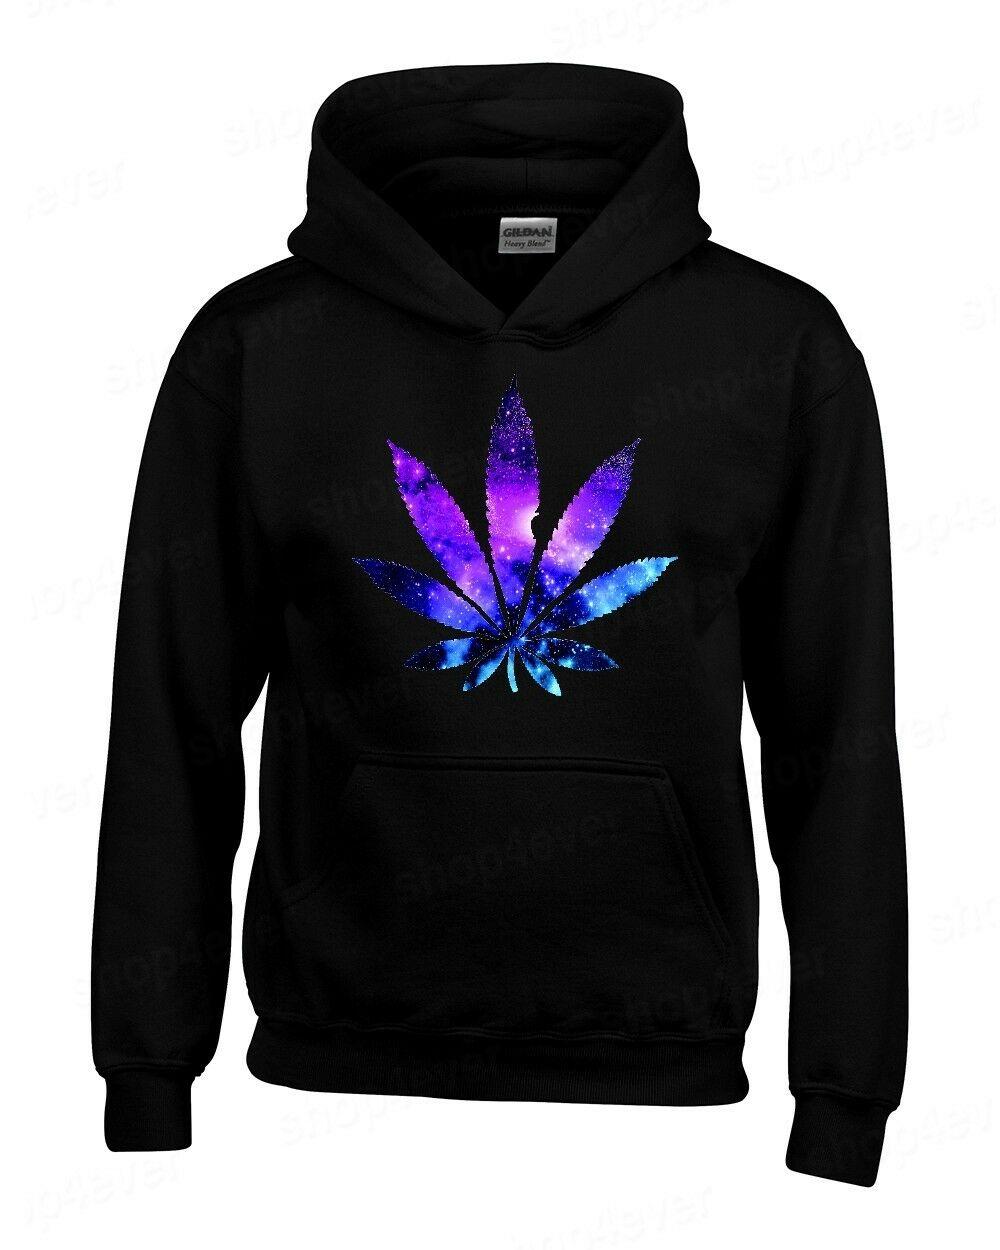 Galaxy Weed Leaf Hoodie Marijuana Cannabis Stoner Kush Pot 420 Sweatshirts 1